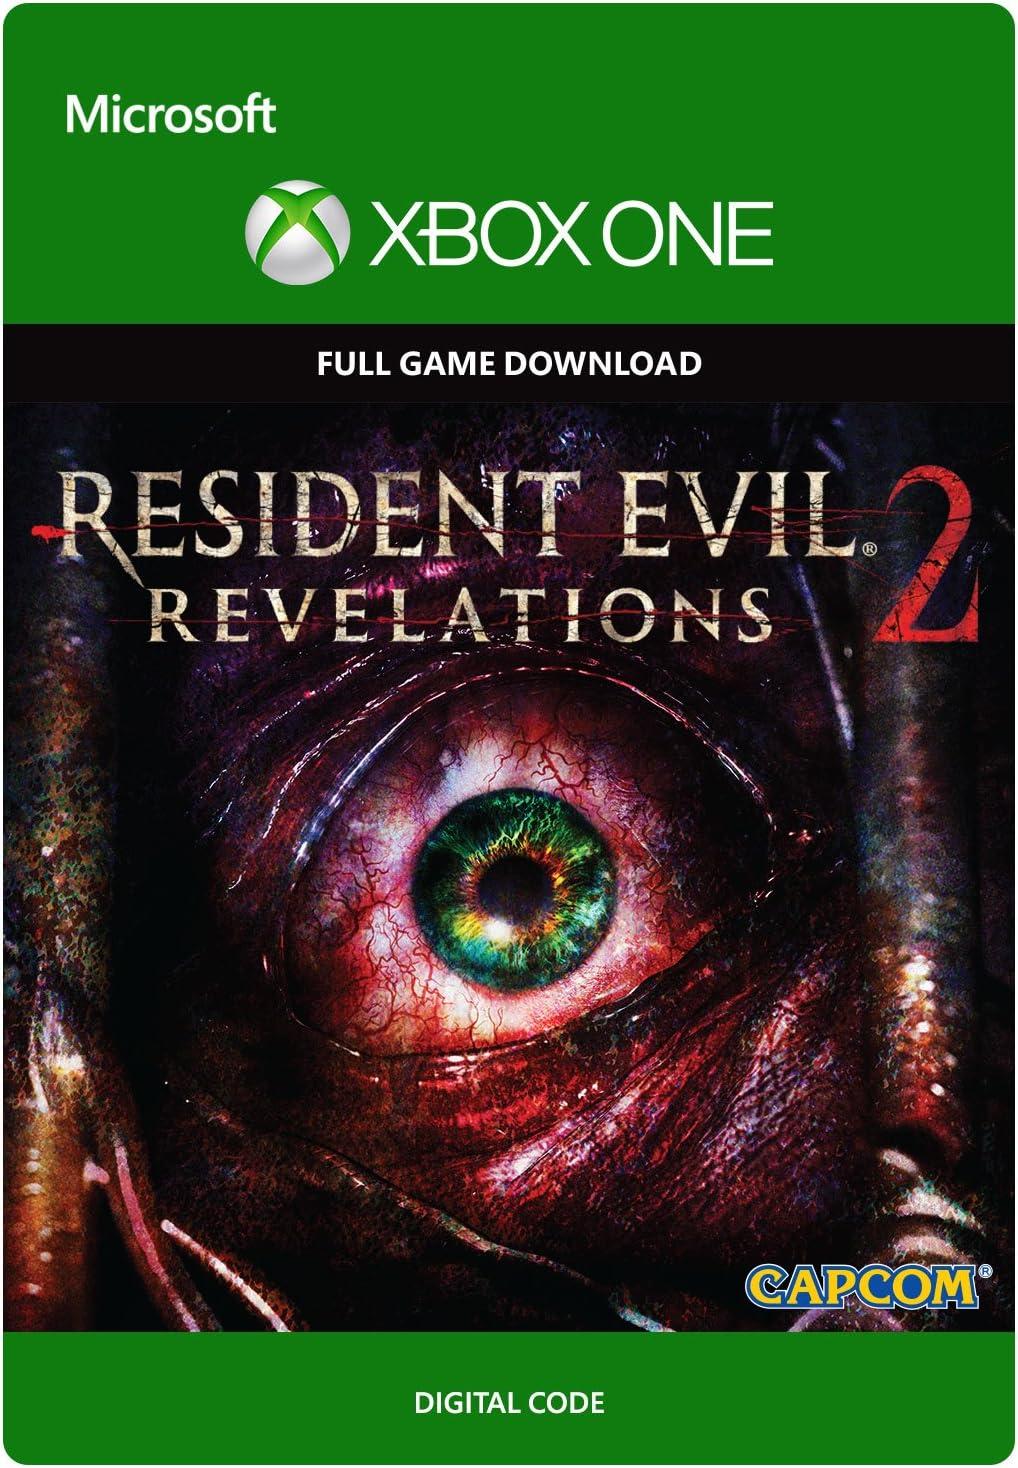 Resident Evil Revelations 2 Playstation 3 Capcom Switch Revelation English Us Games U S A Inc Video